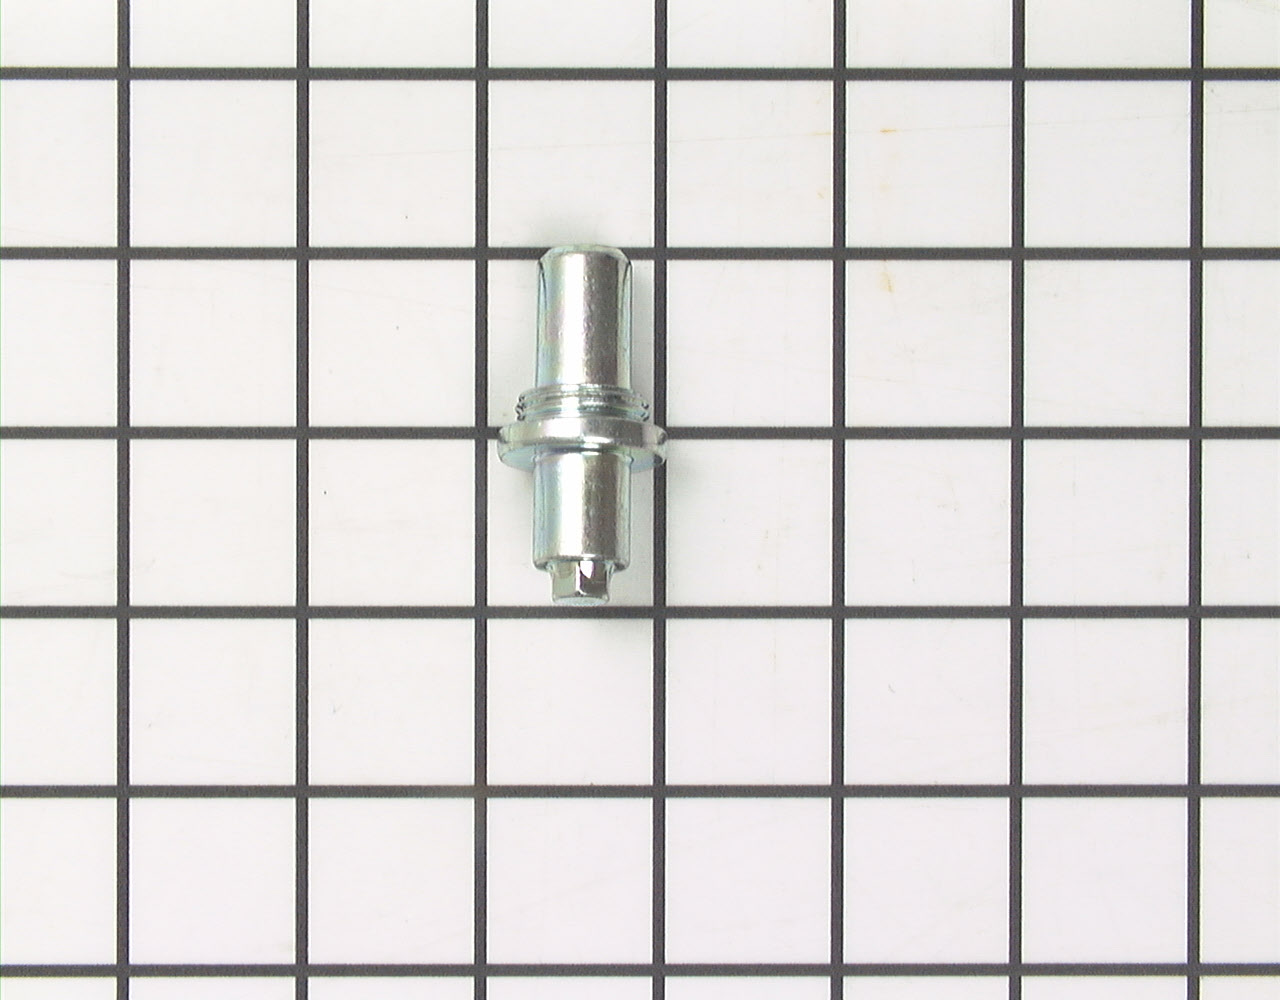 WP67006744 Ikea Refrigerator Part -Hinge Pin